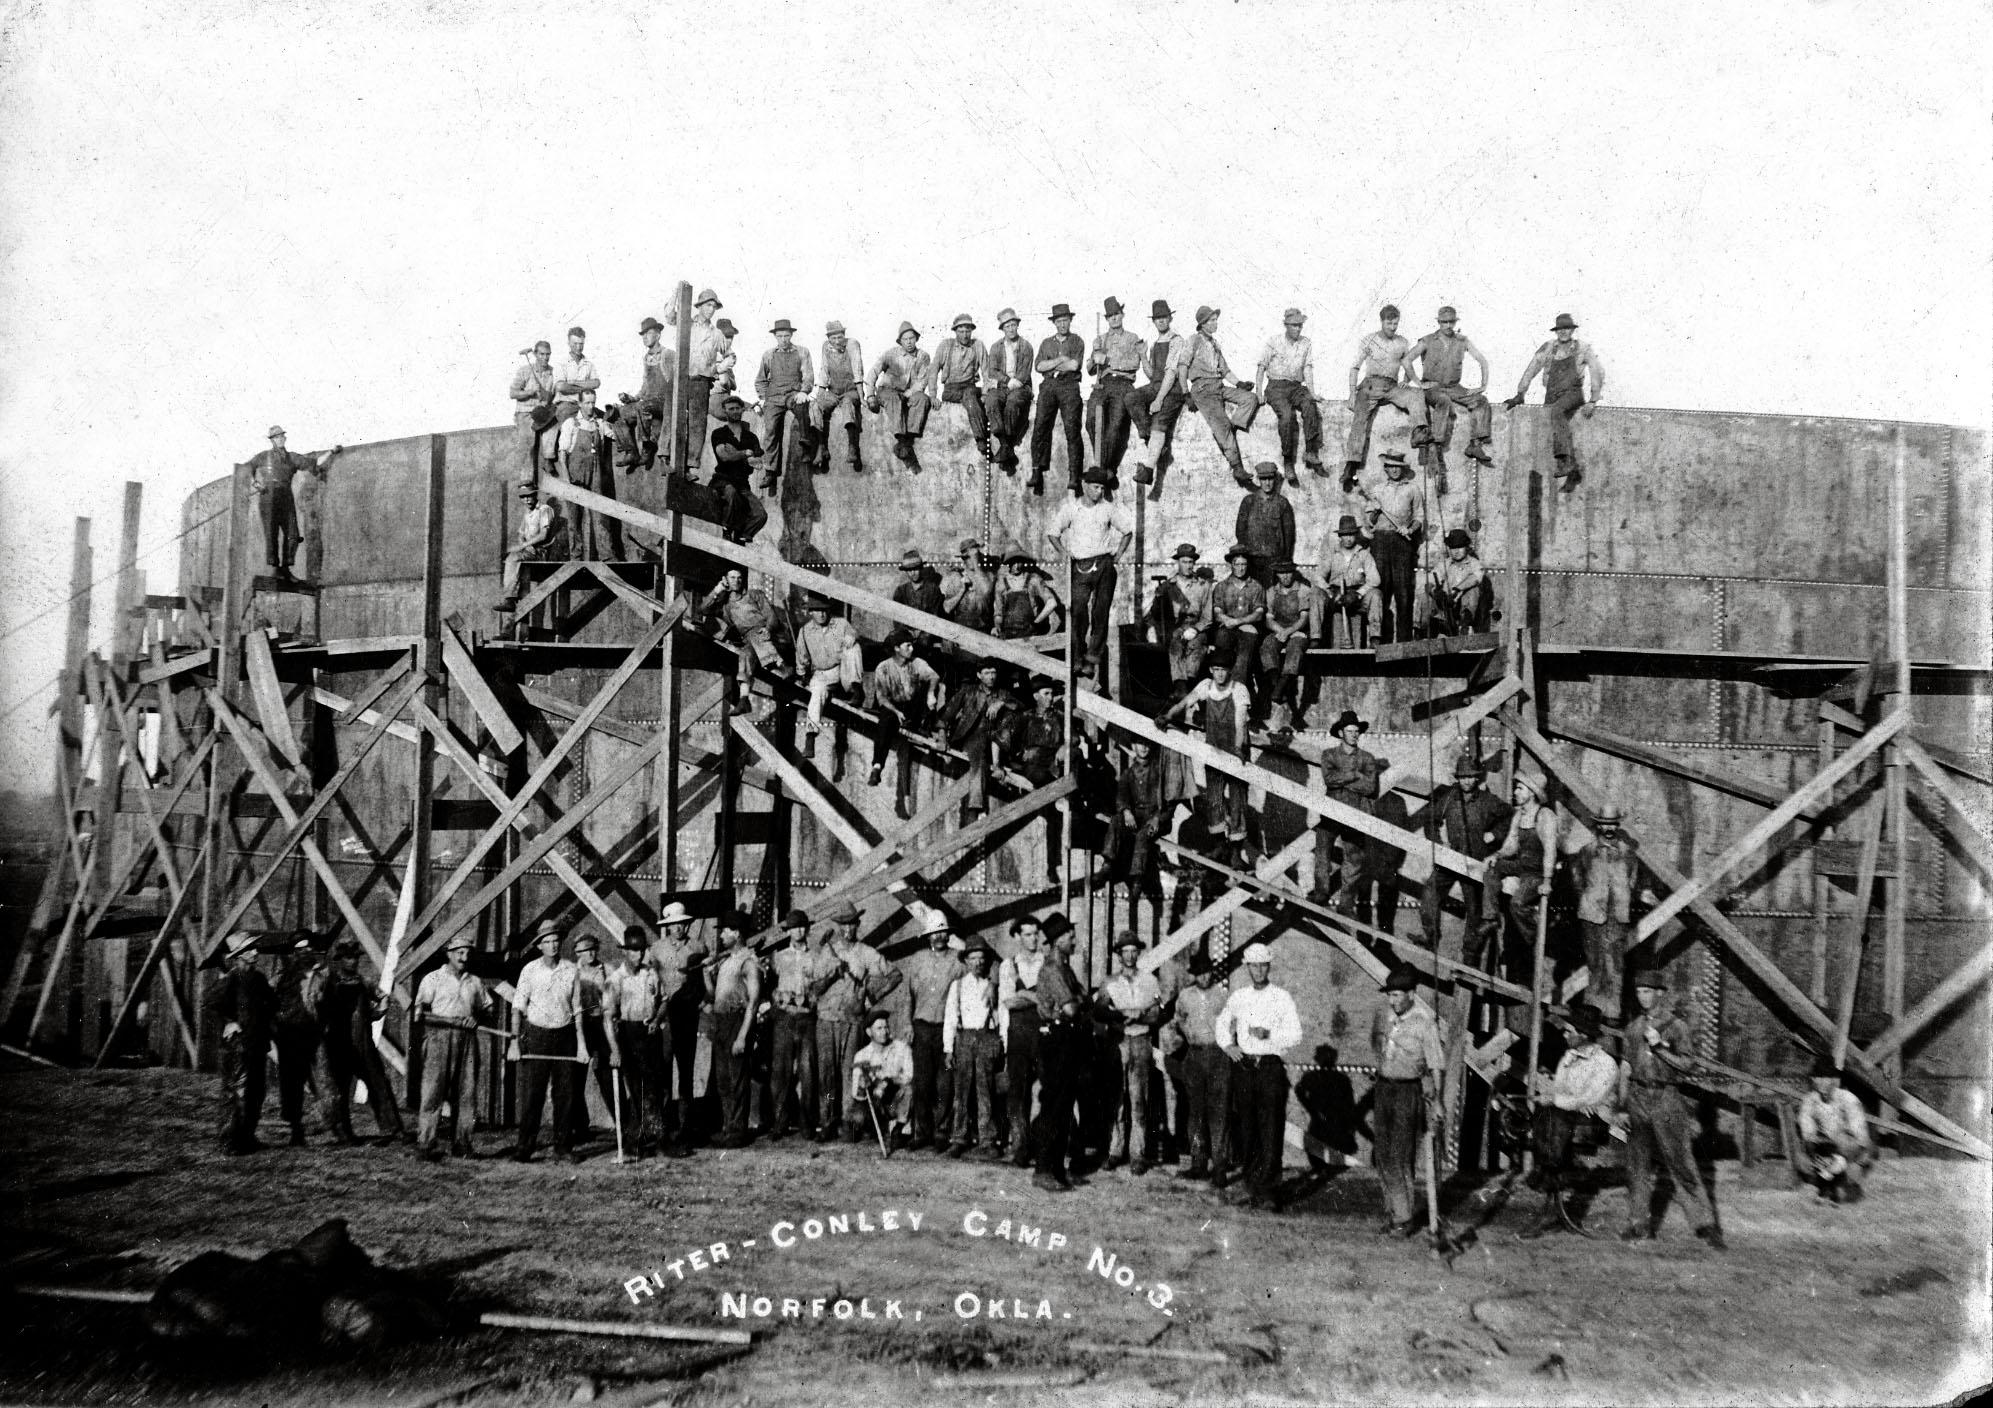 Riter-Conley Camp, No. 3